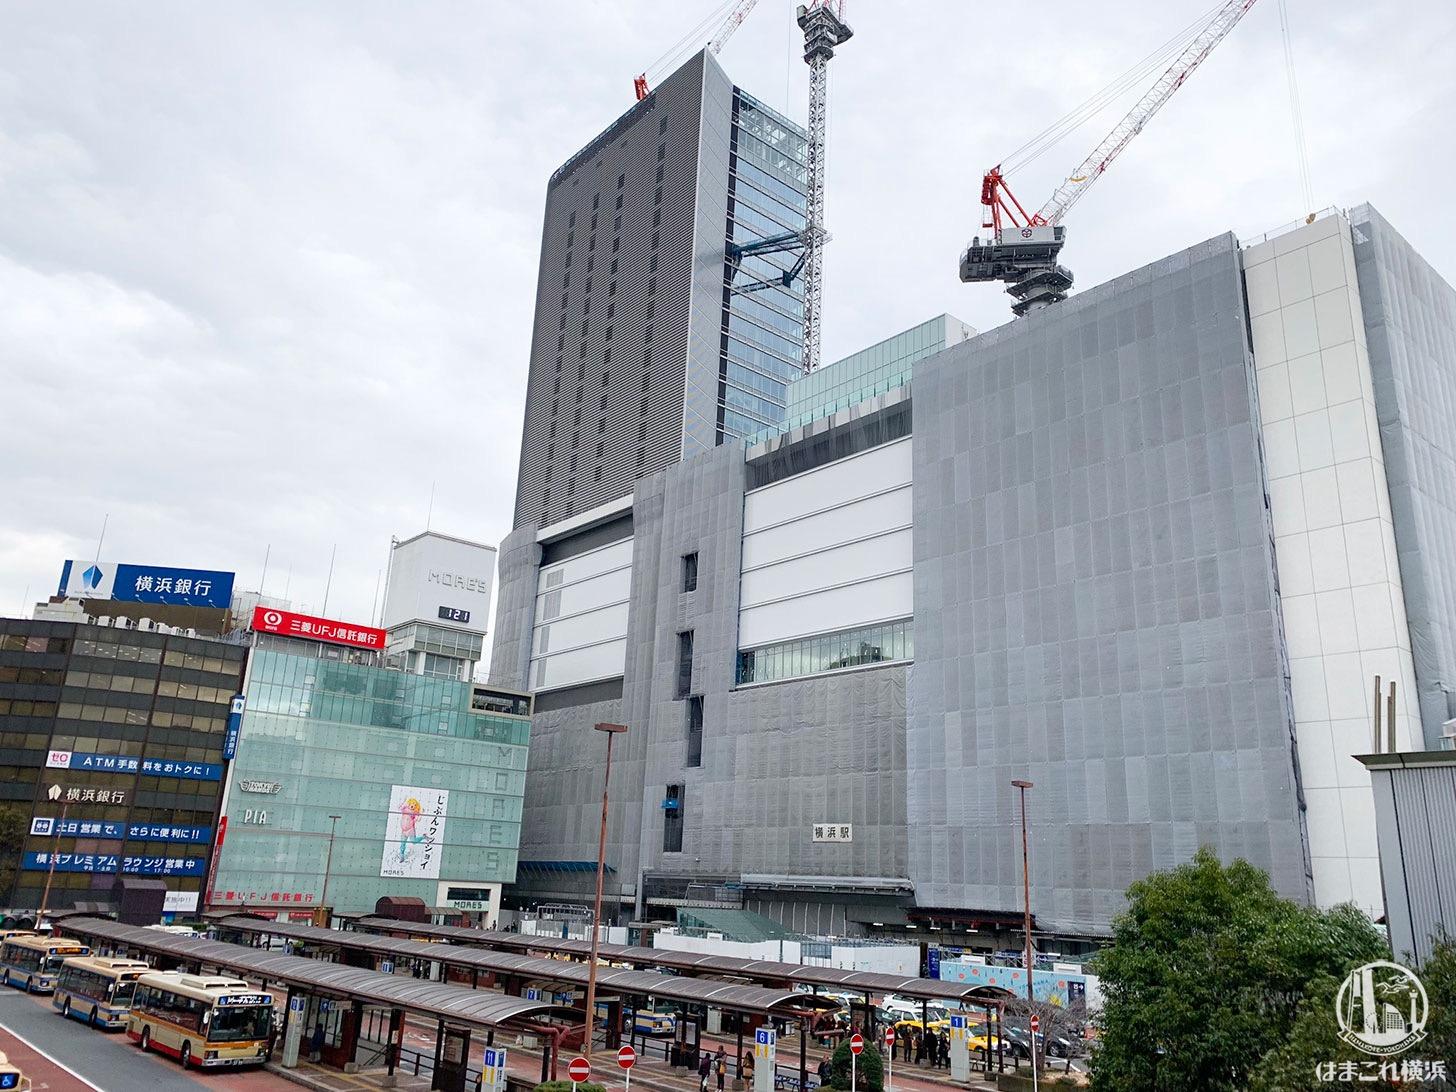 2019年2月 横浜駅西口の様子